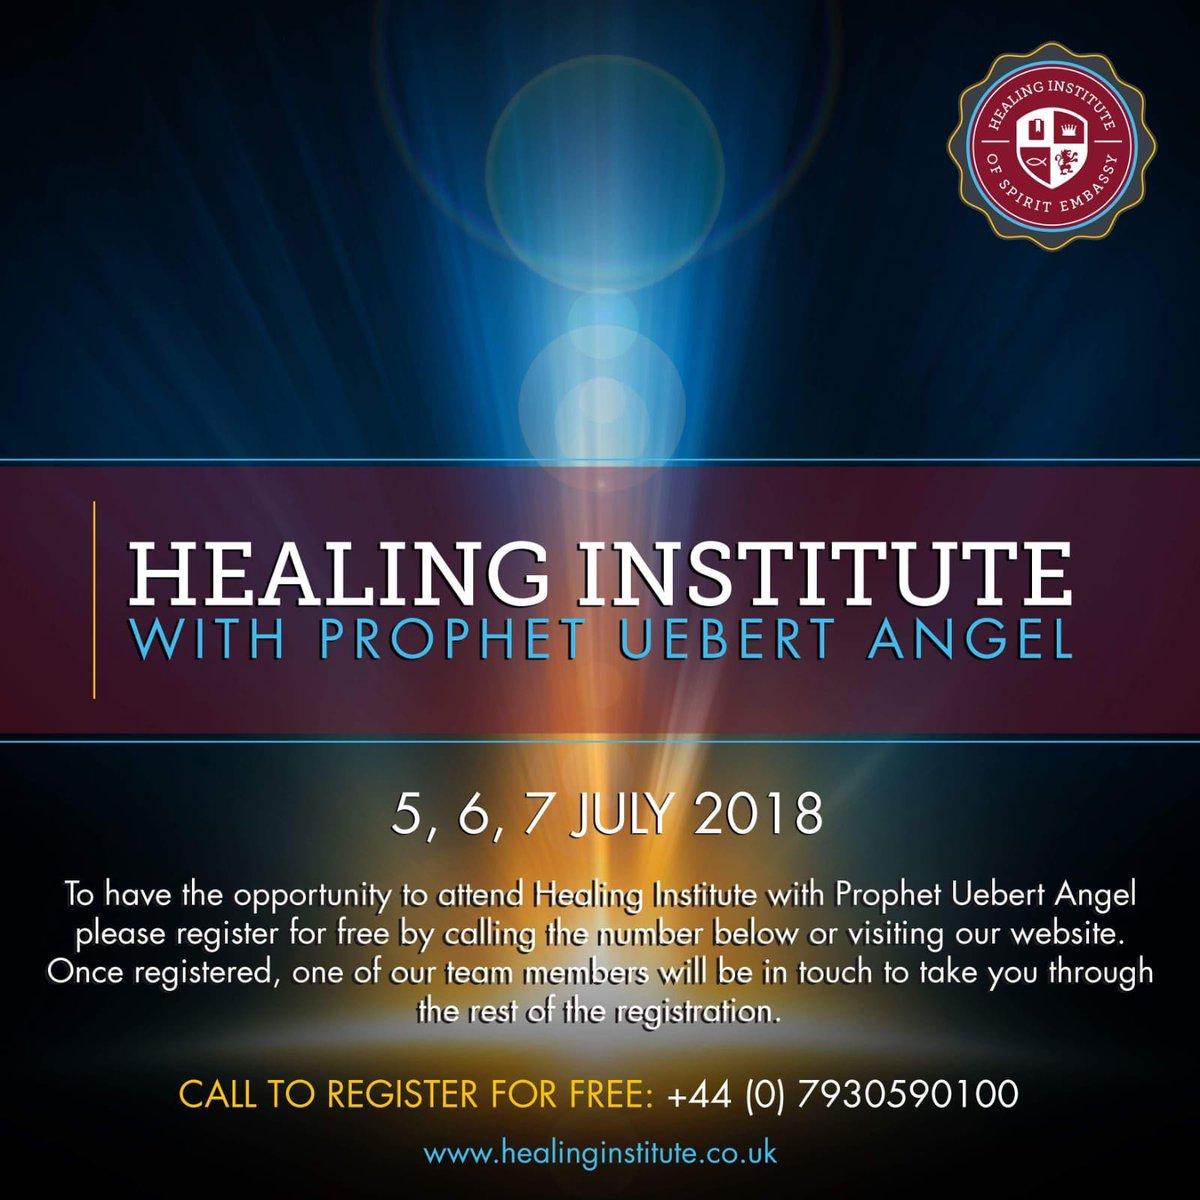 healinginstitute hashtag on Twitter